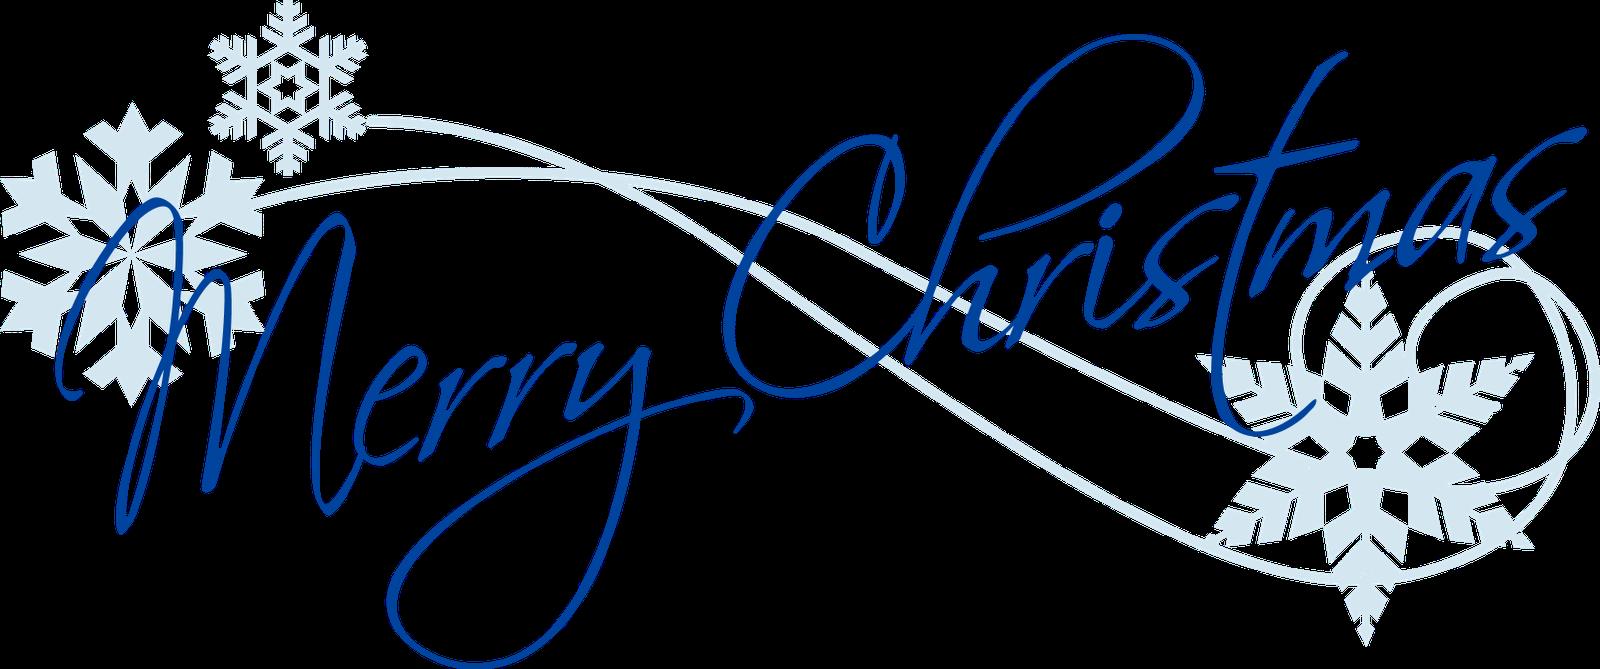 One Line Font Art : Image merry christmas animal jam clans wiki